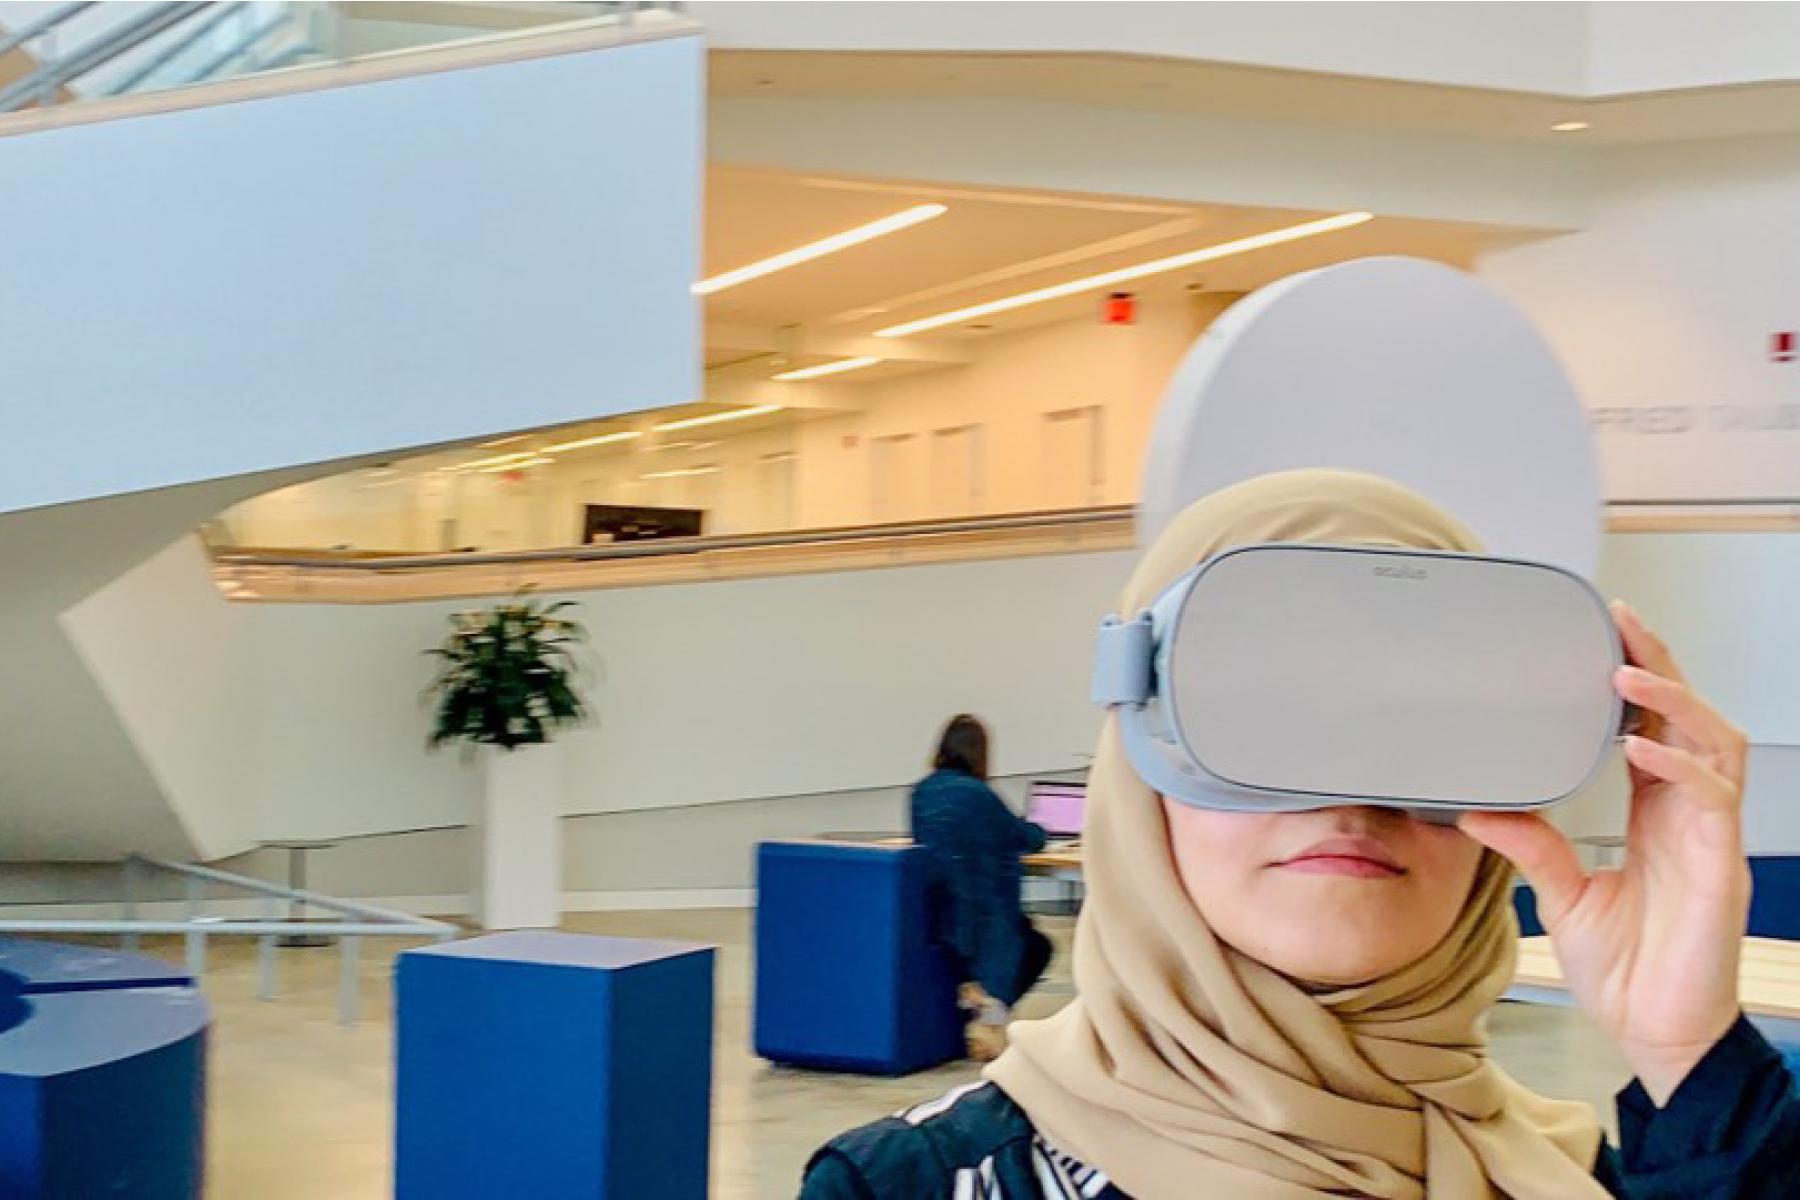 Alaa Algargoosh wears a virtual reality headset inside a church.